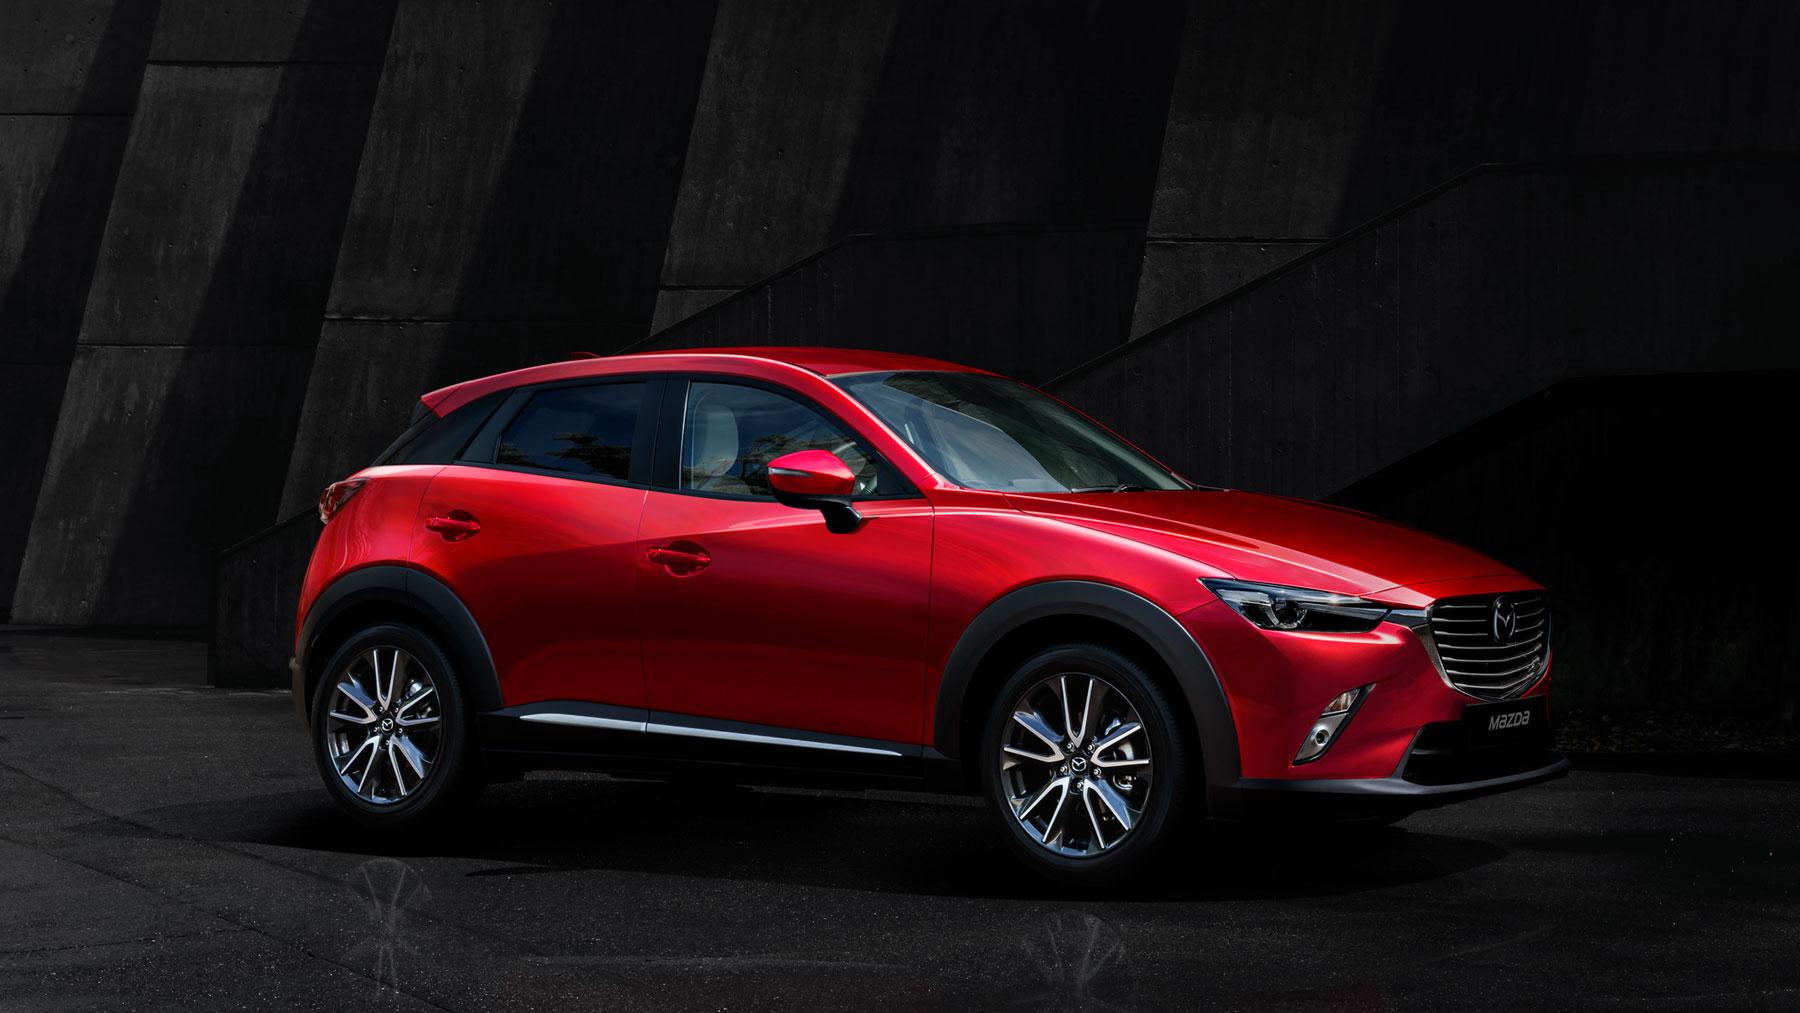 Hall Mazda Virginia Beach | Drive with Confidence in the 2018 Mazda